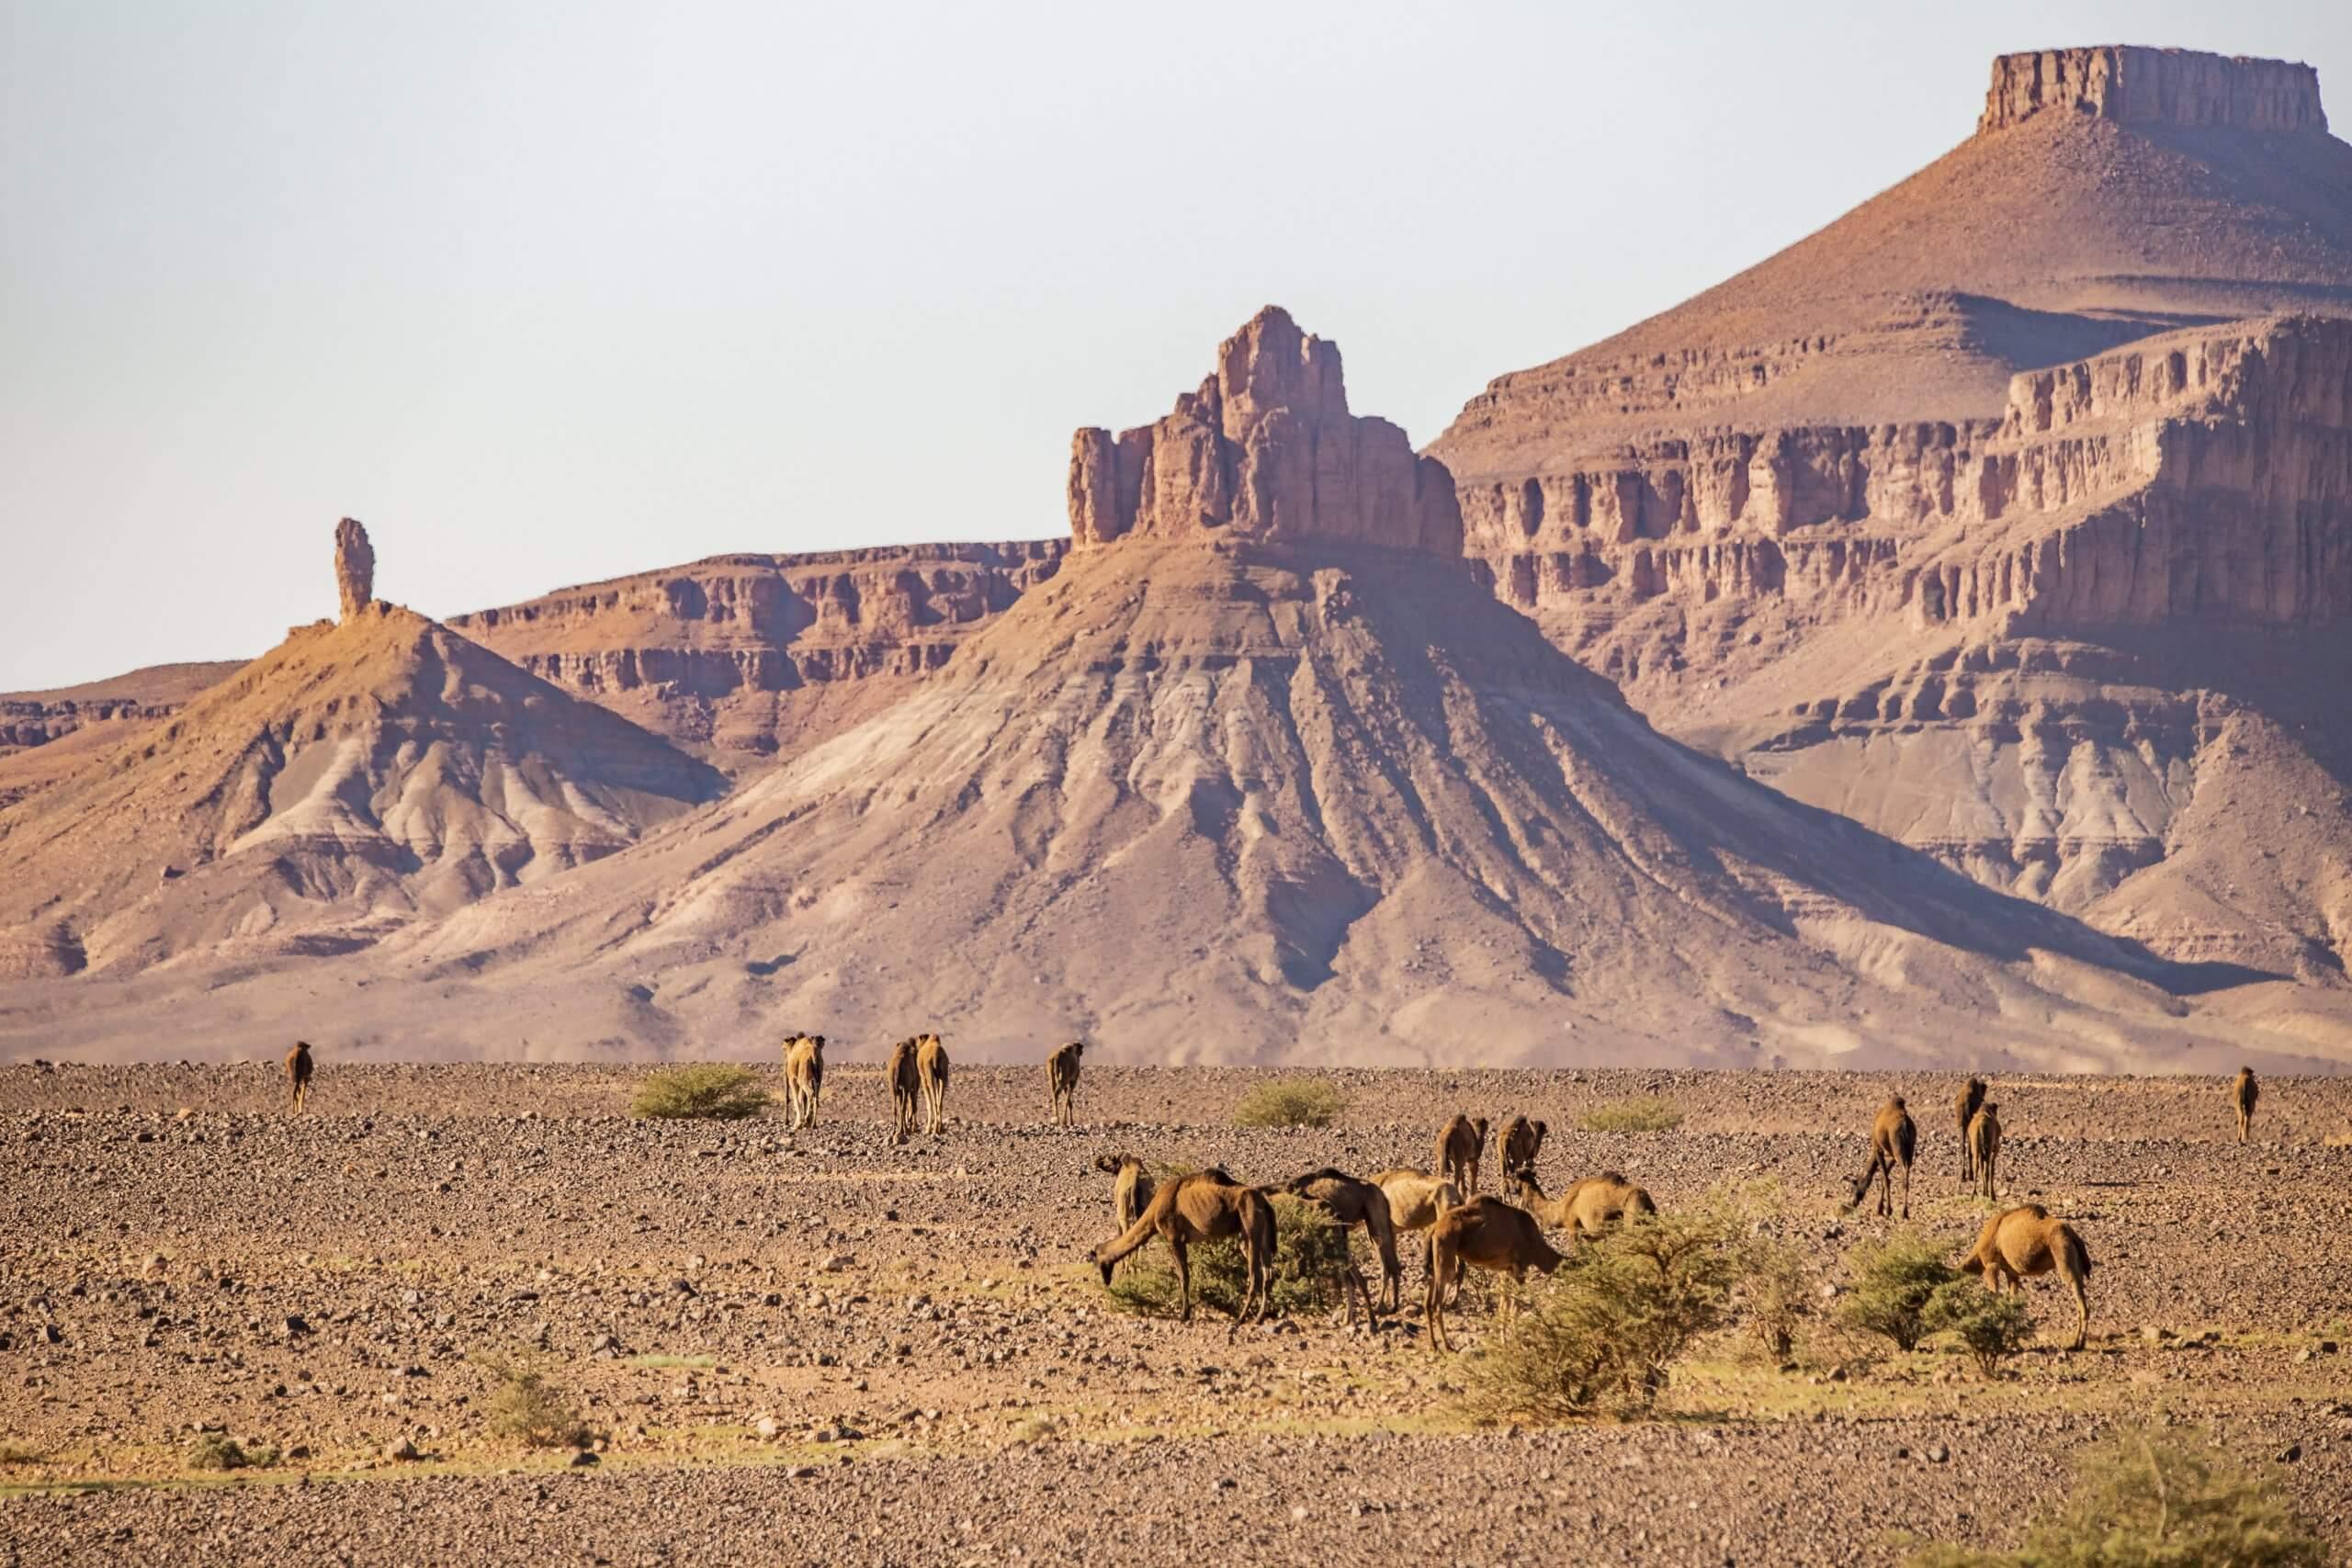 Tafelberge nahe Foum Zguid